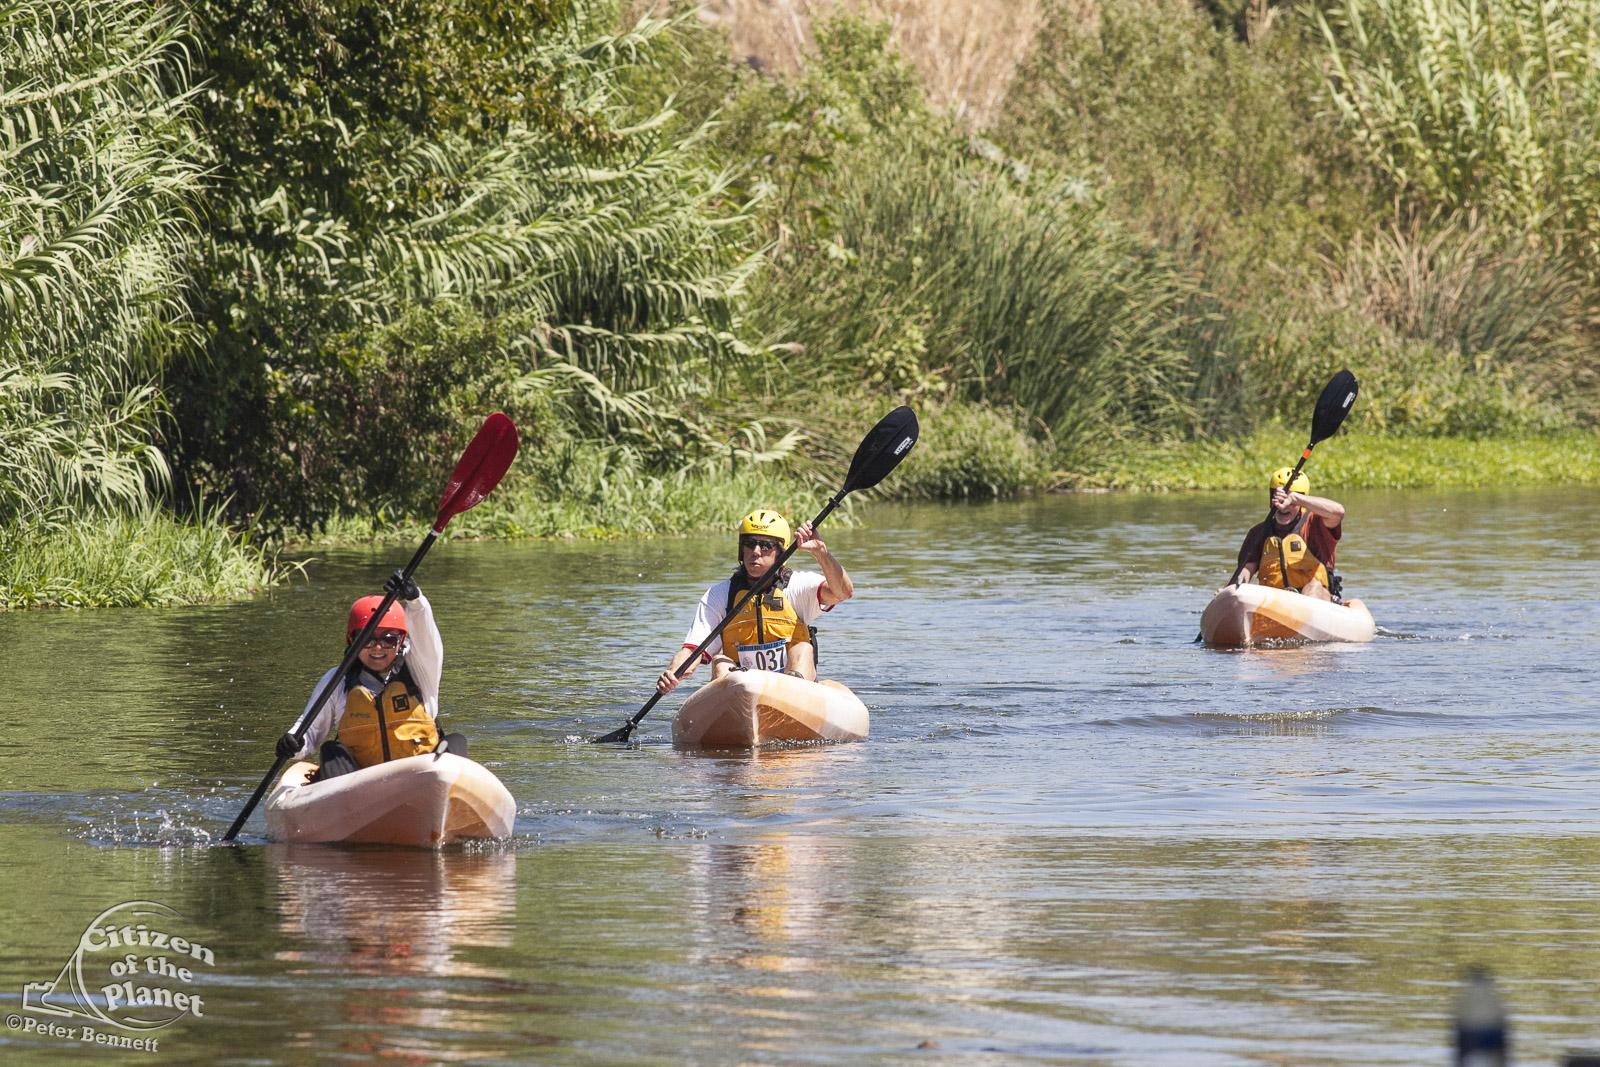 US_CA_48_3881_la_river_boat_race.jpg